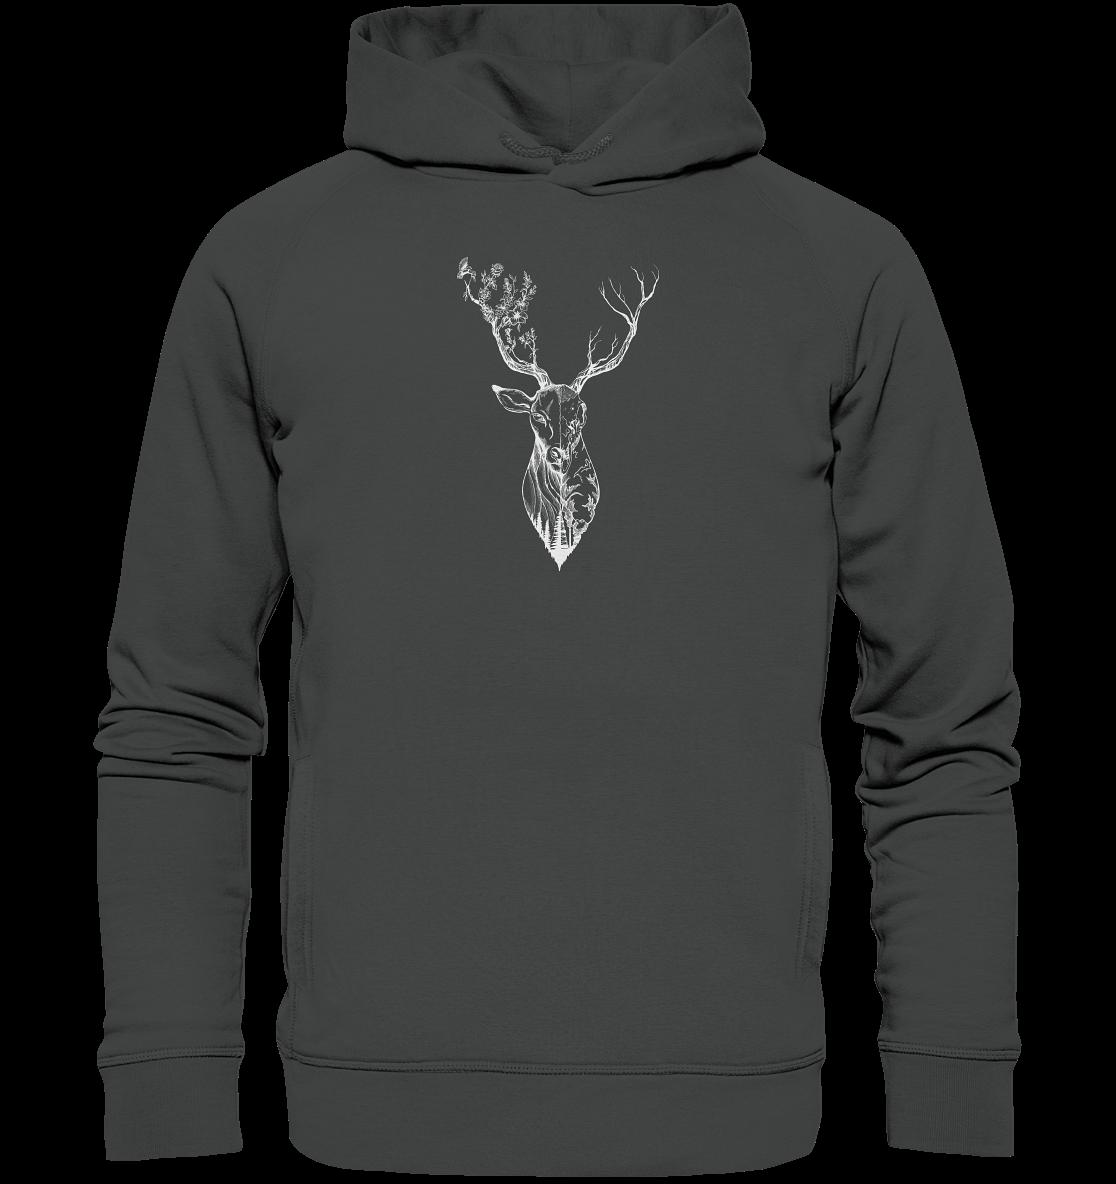 front-organic-fashion-hoodie-444545-1116x-7.png